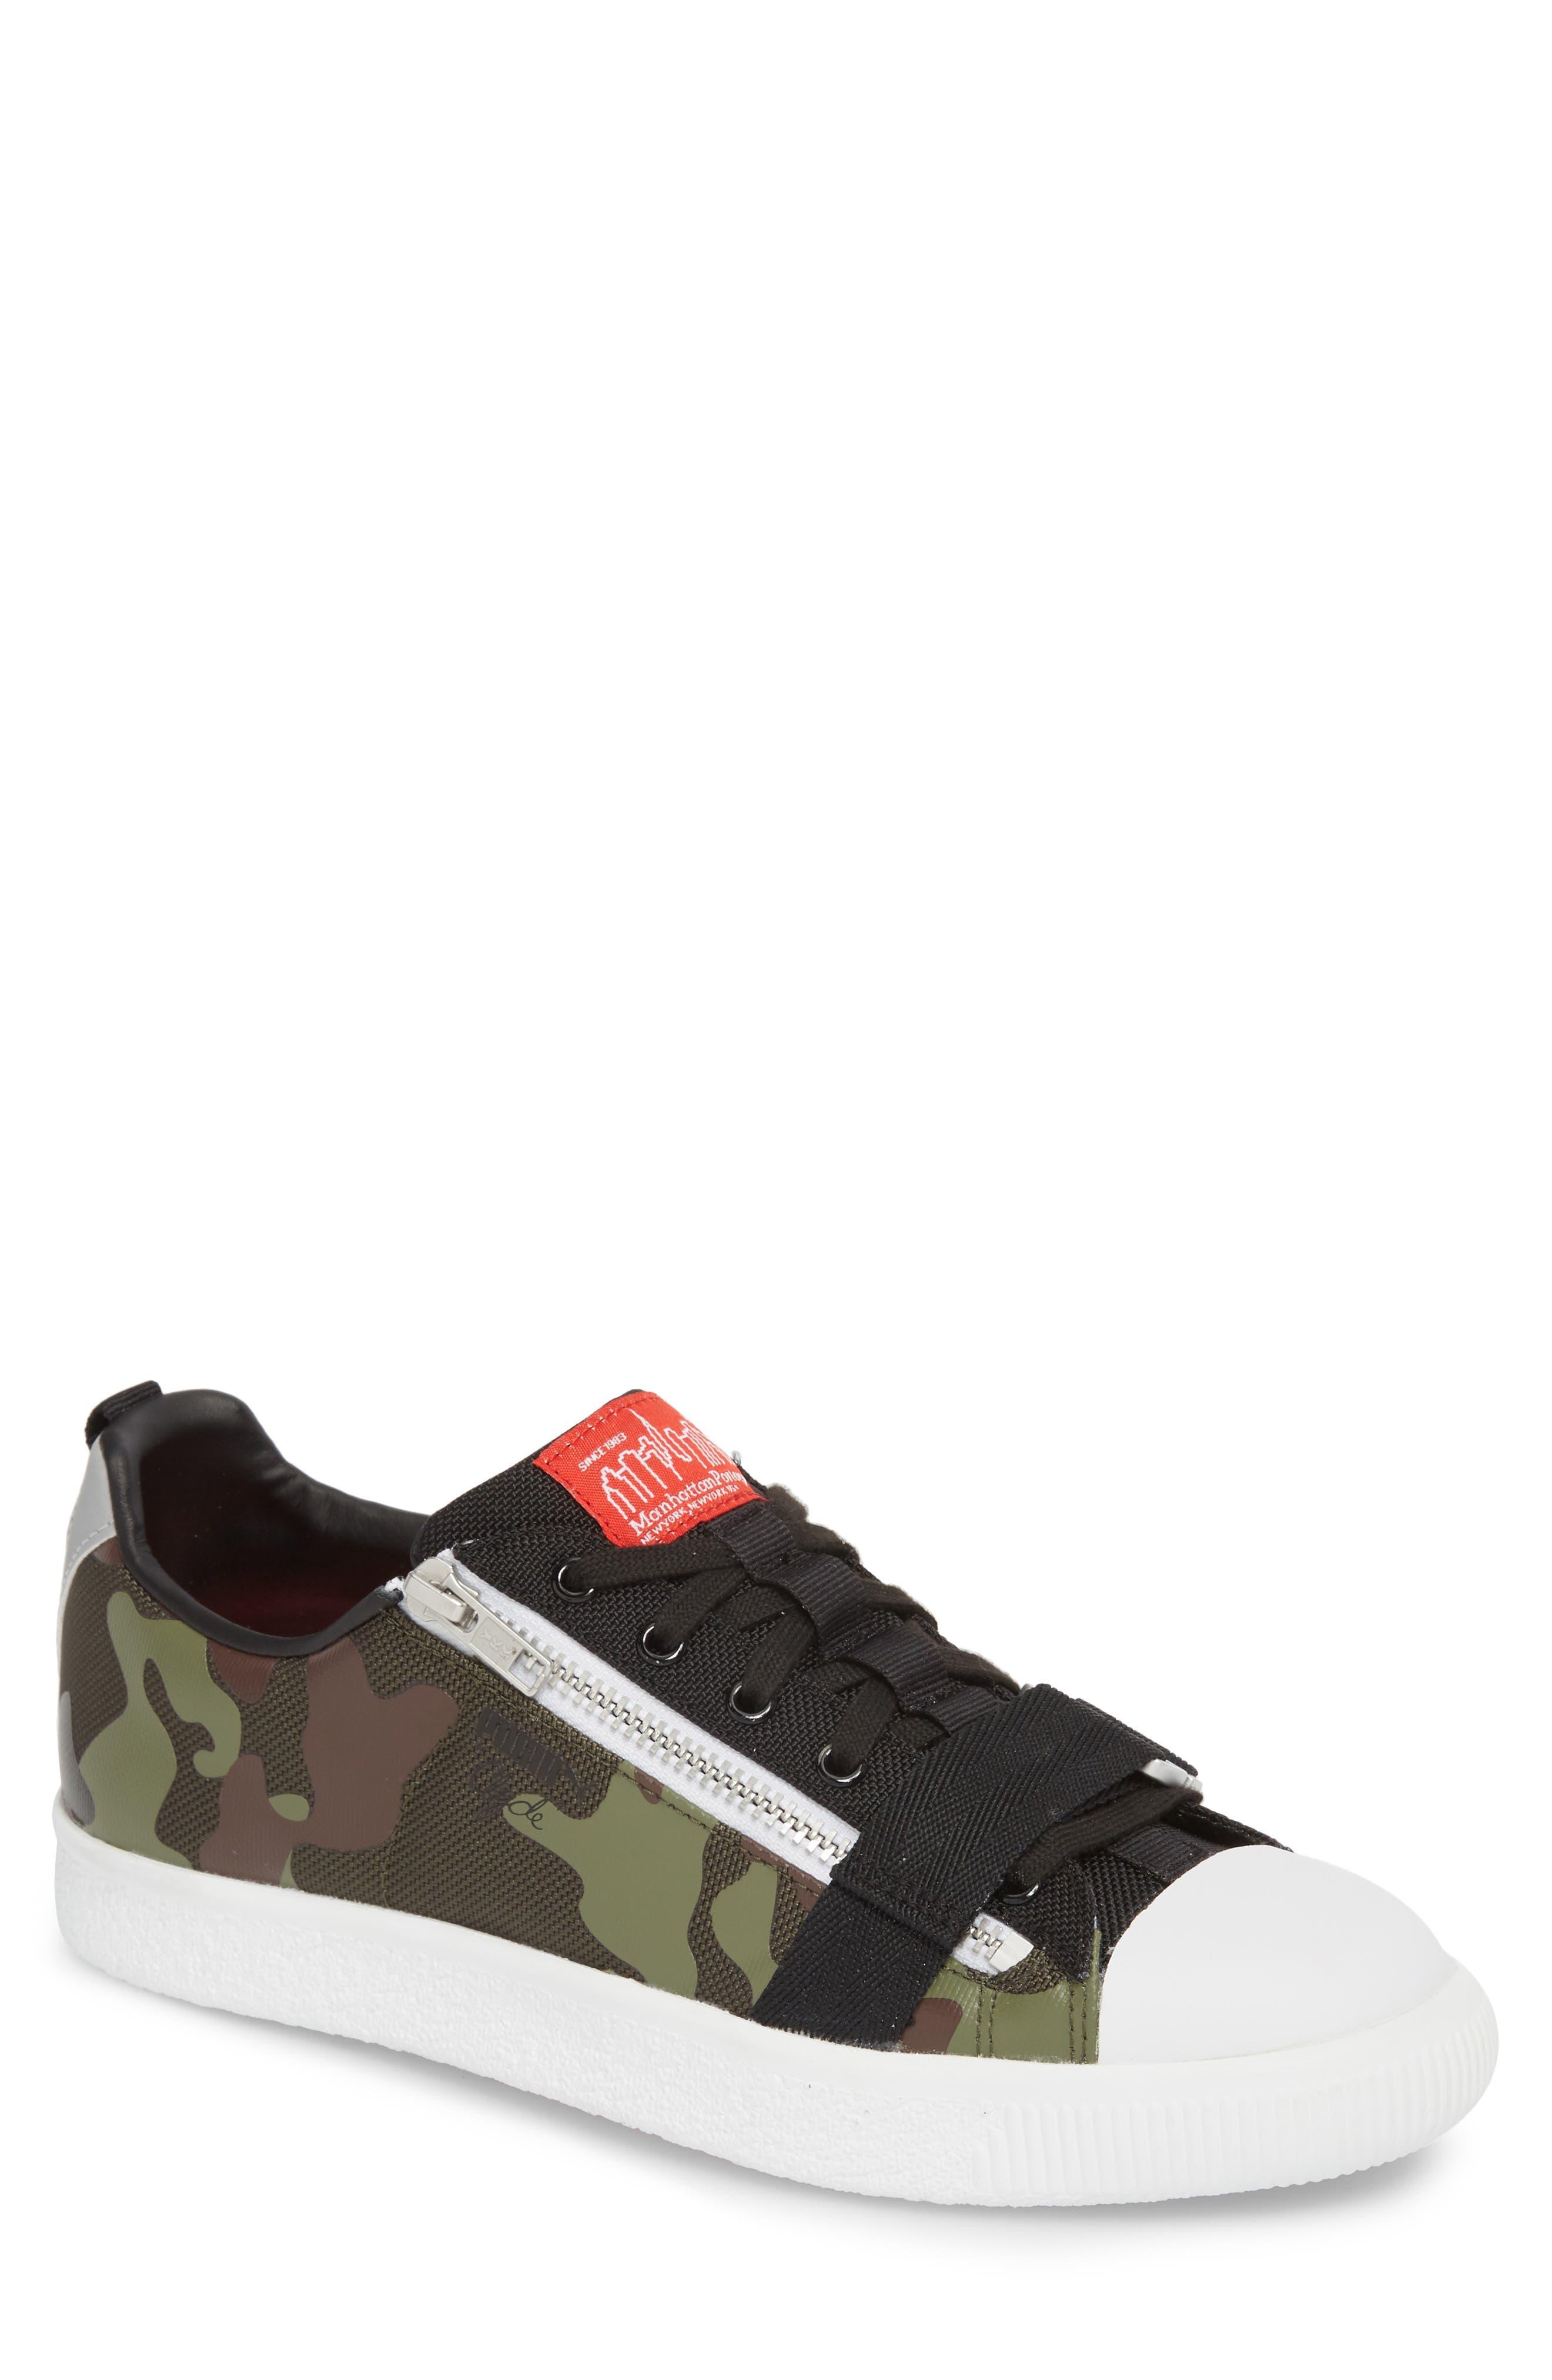 x MANHATTAN PORTAGE Clyde Zip Sneaker,                         Main,                         color, 300